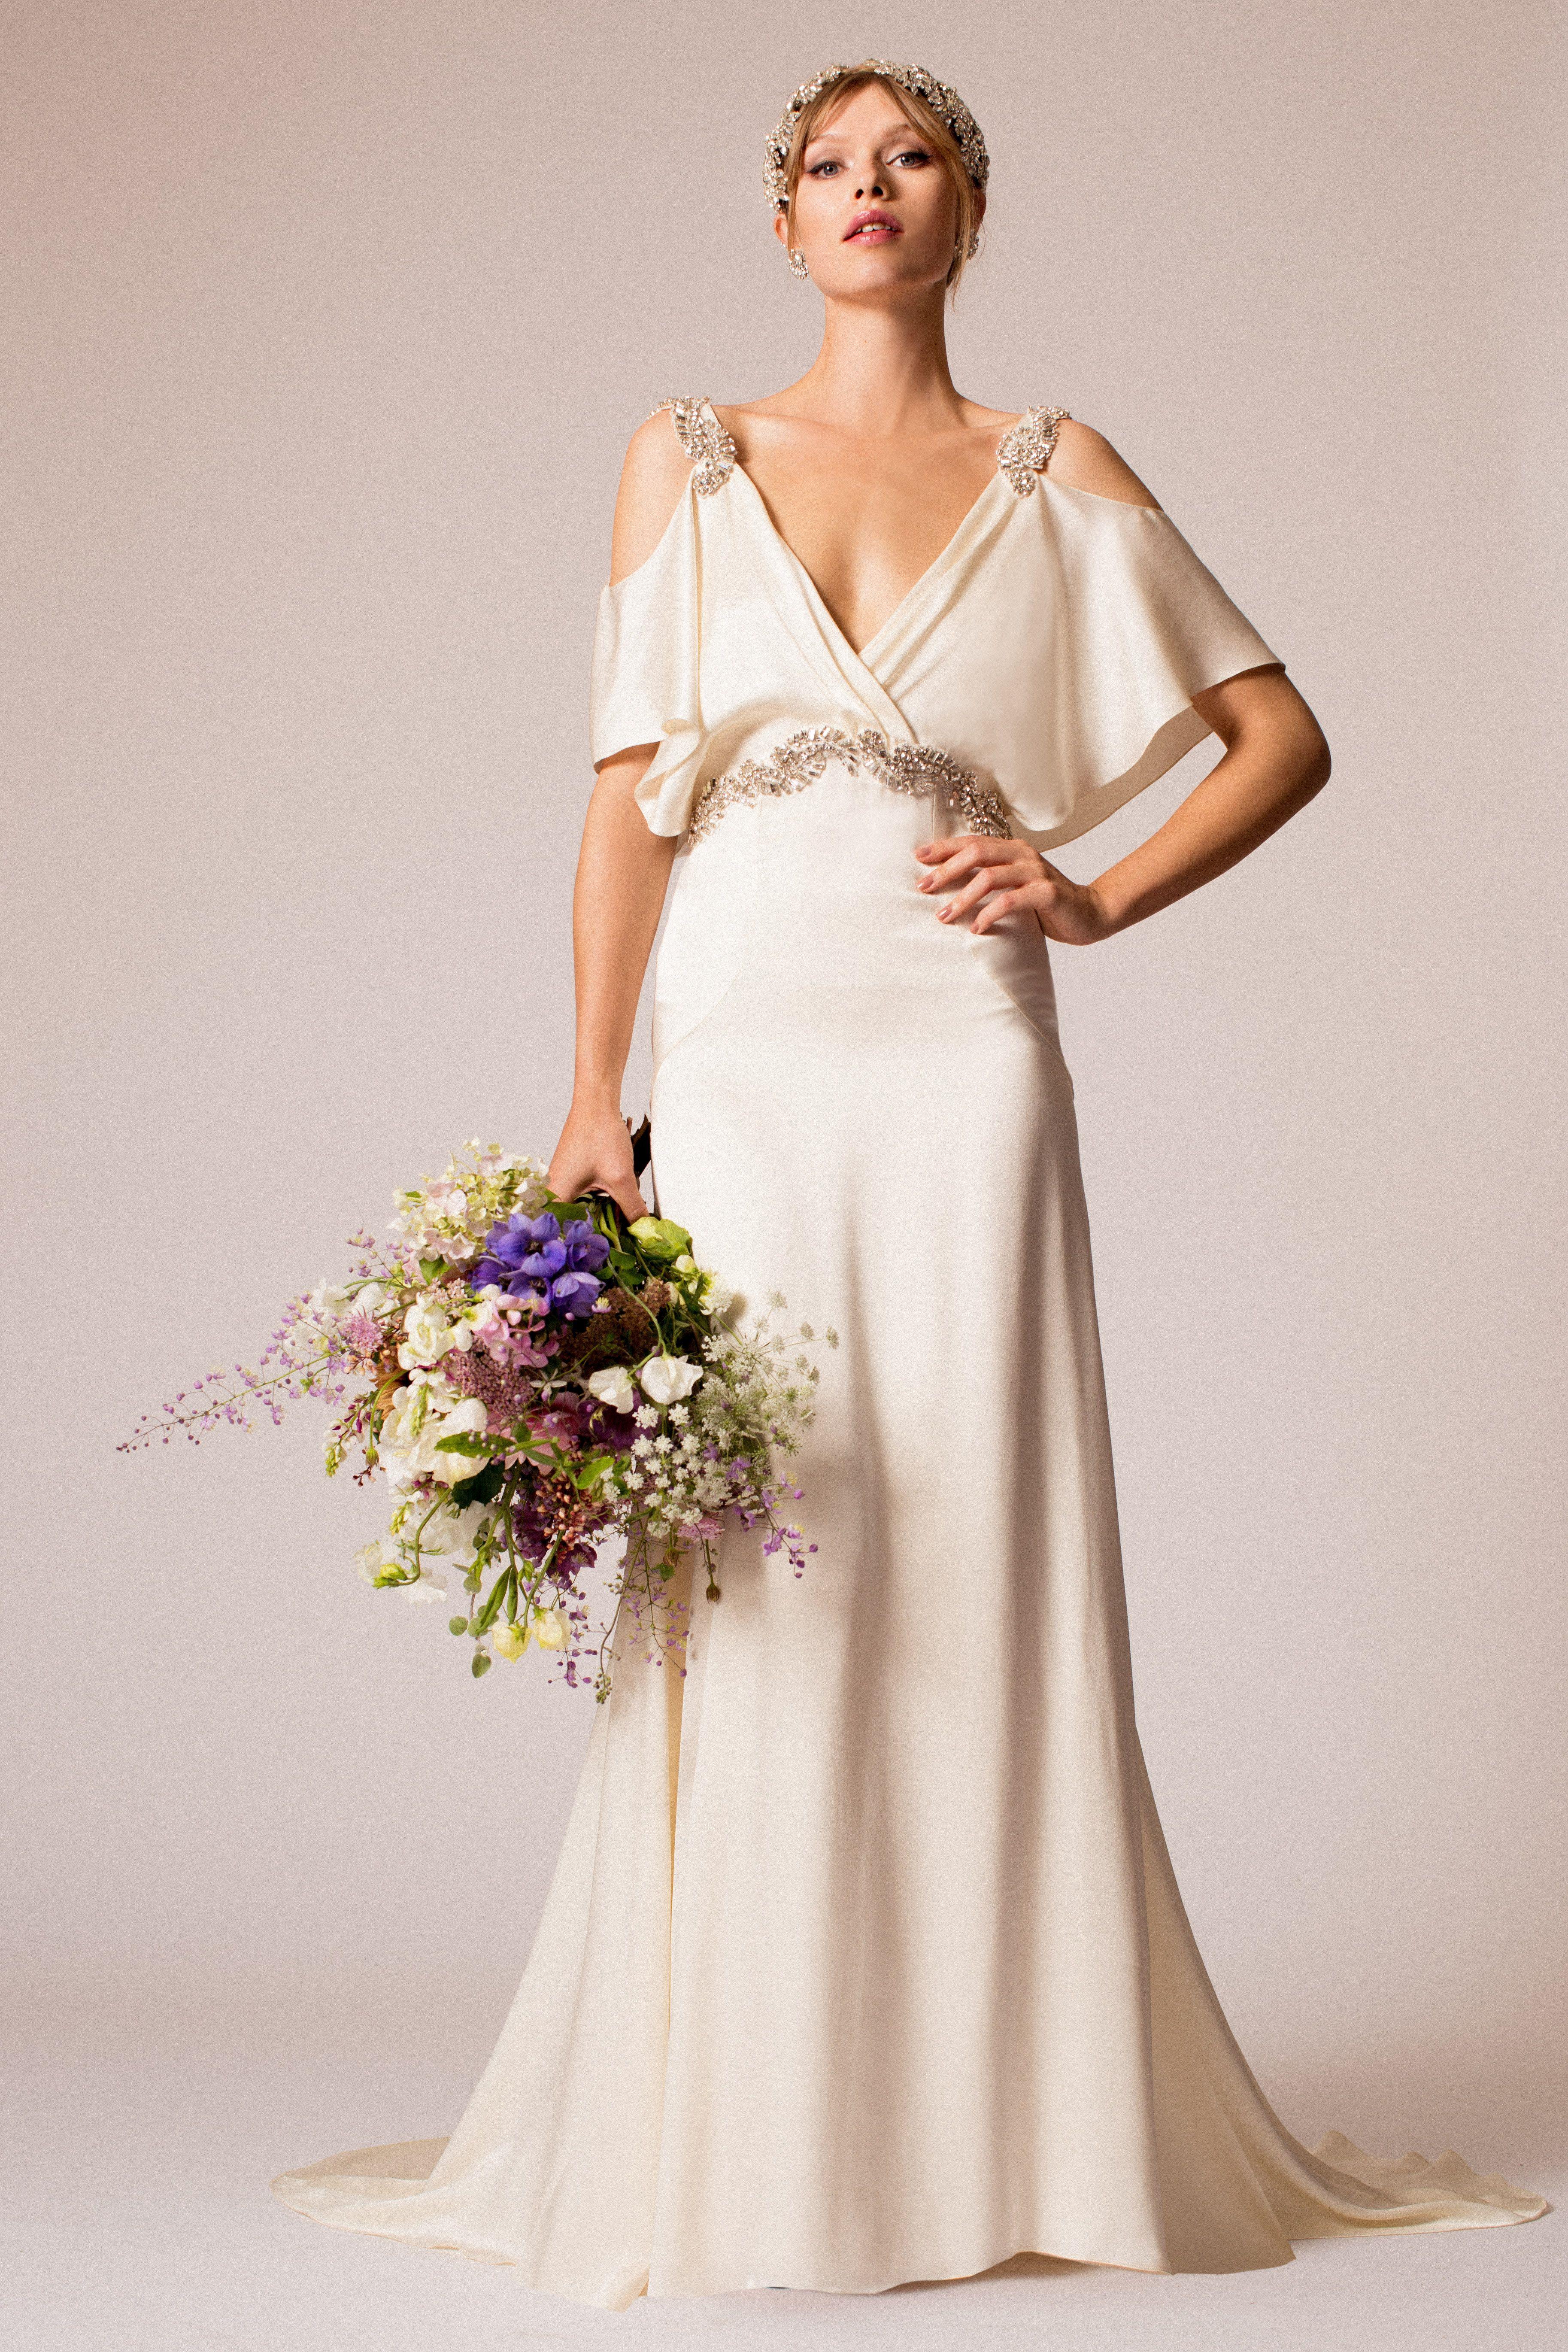 The Temperley Bridal Tabitha Dress Glam Wedding Dress Wedding Dresses Kleinfeld Temperley London Bridal